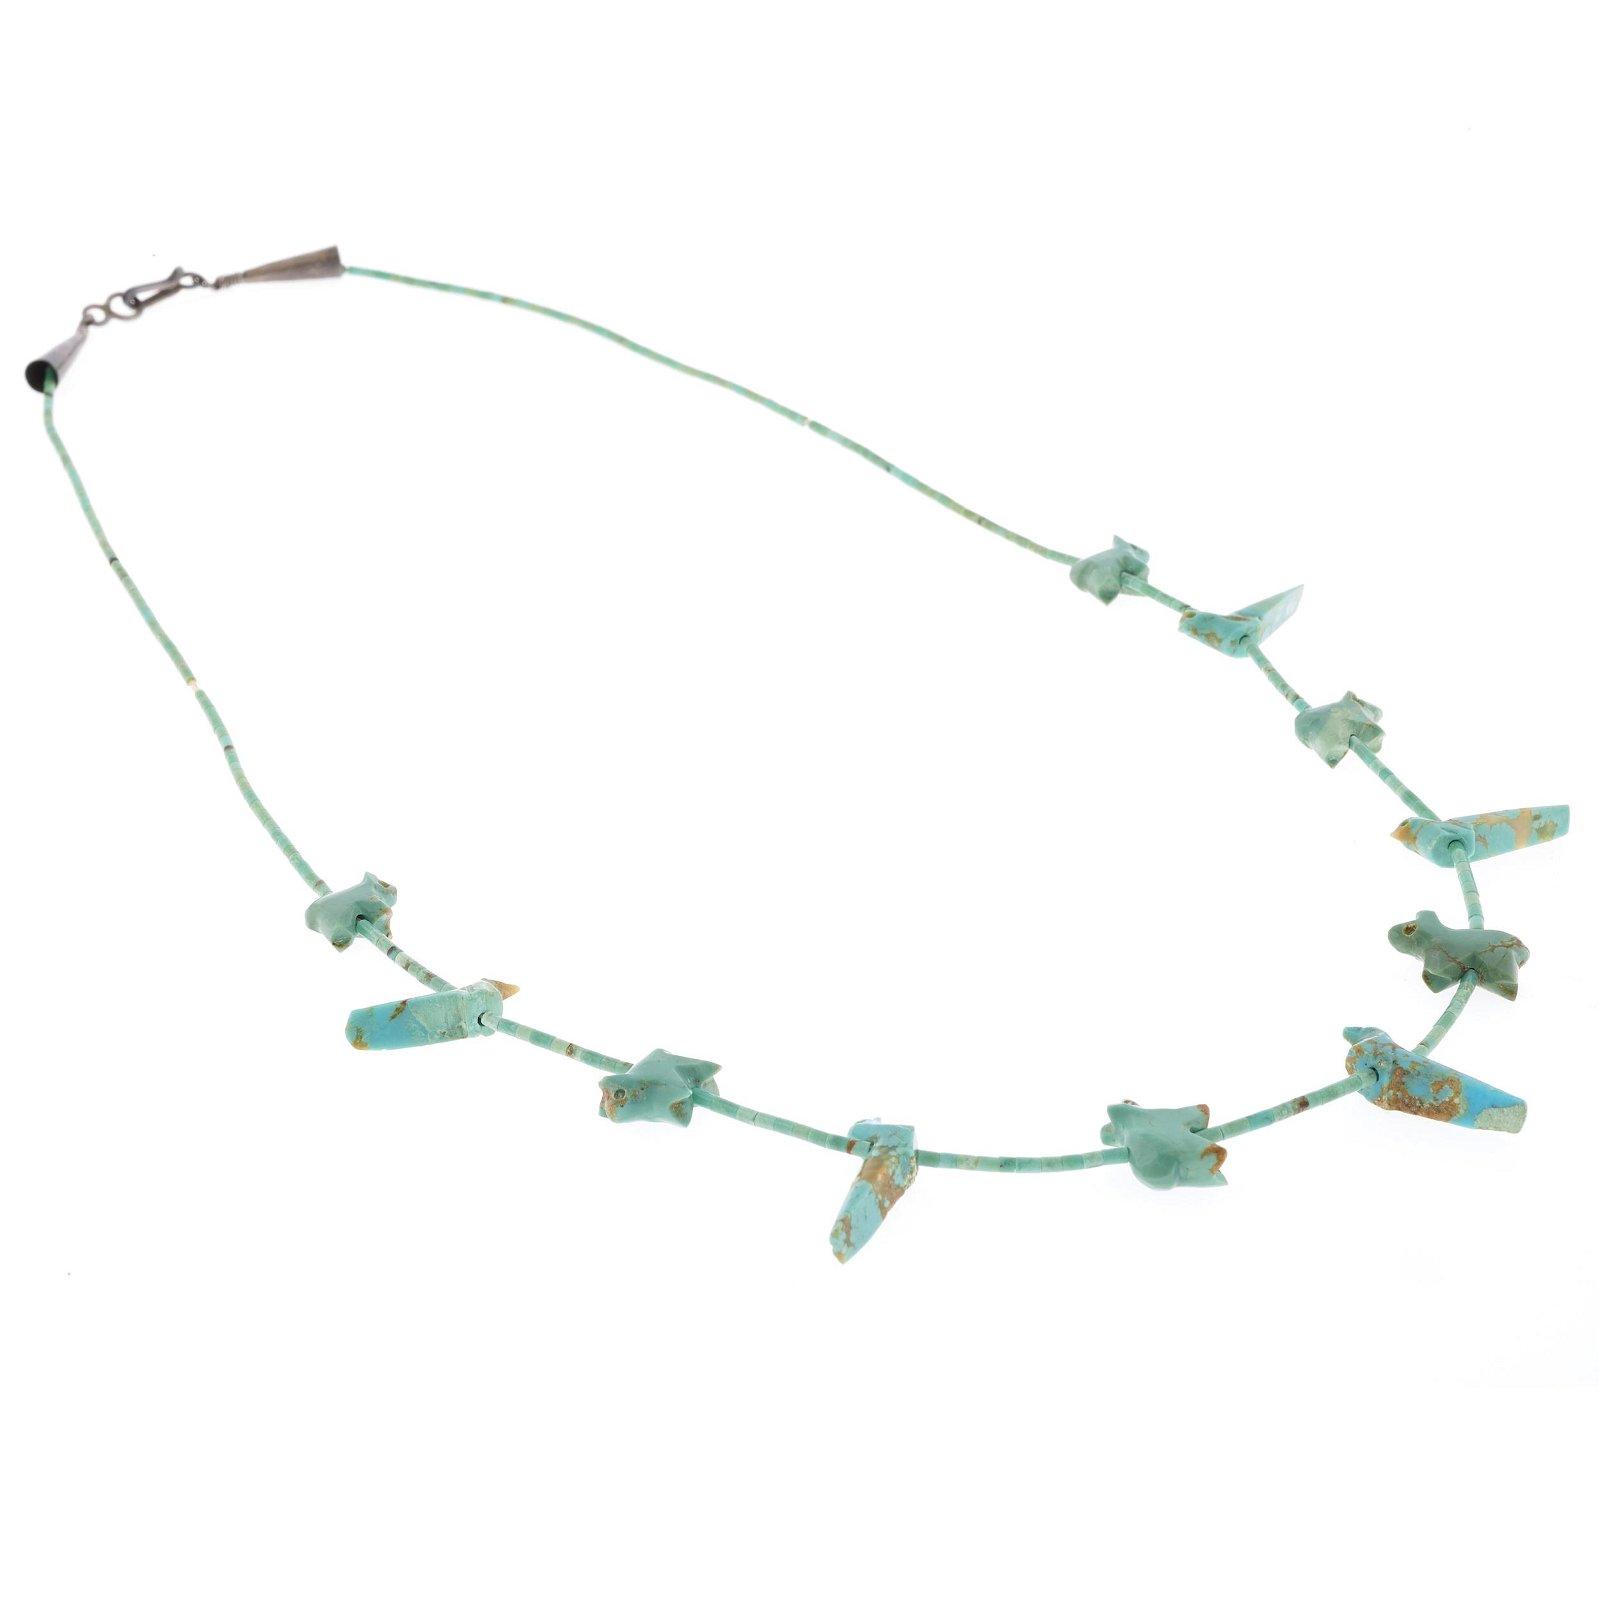 A Zuni turquoise fetish necklace